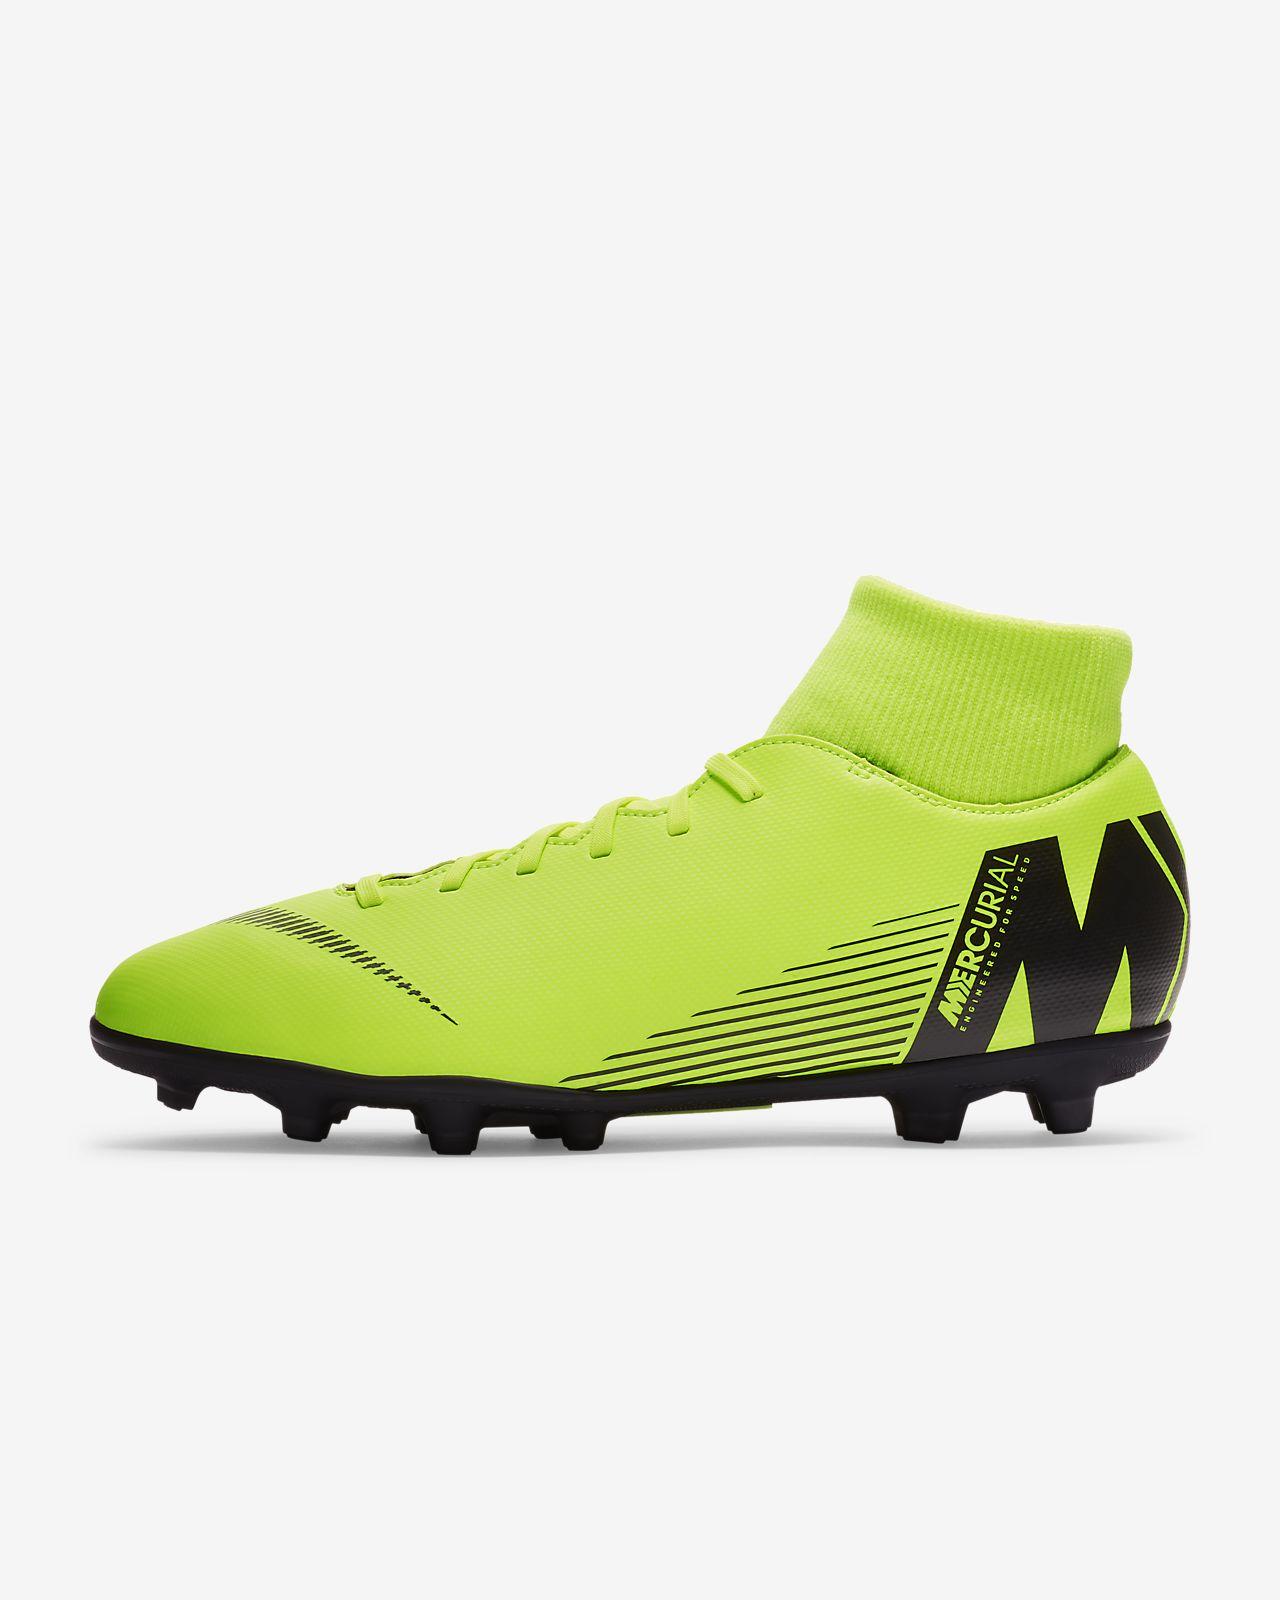 Футбольные бутсы для игры на разных покрытиях Nike Mercurial Superfly VI  Club 6321aff7be1c5